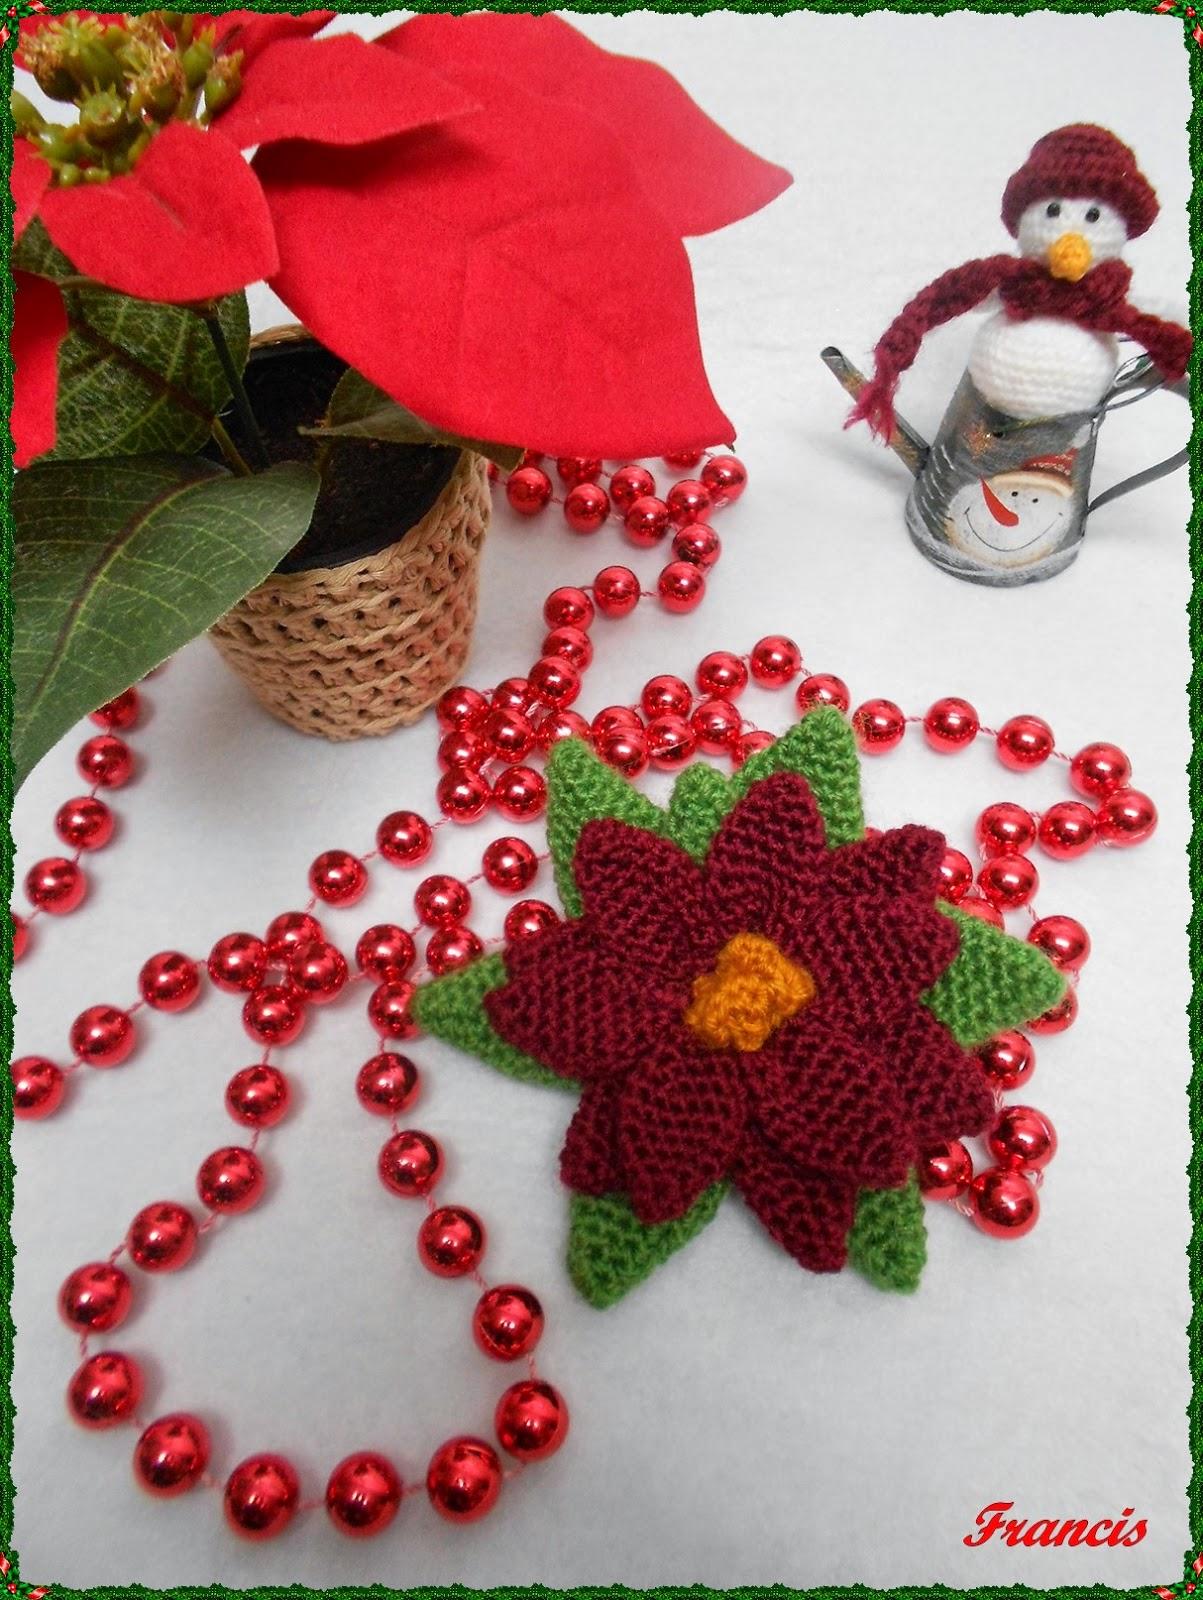 FLOR DE NAVIDAD A CROCHET - Christmas | Patrones Crochet ...